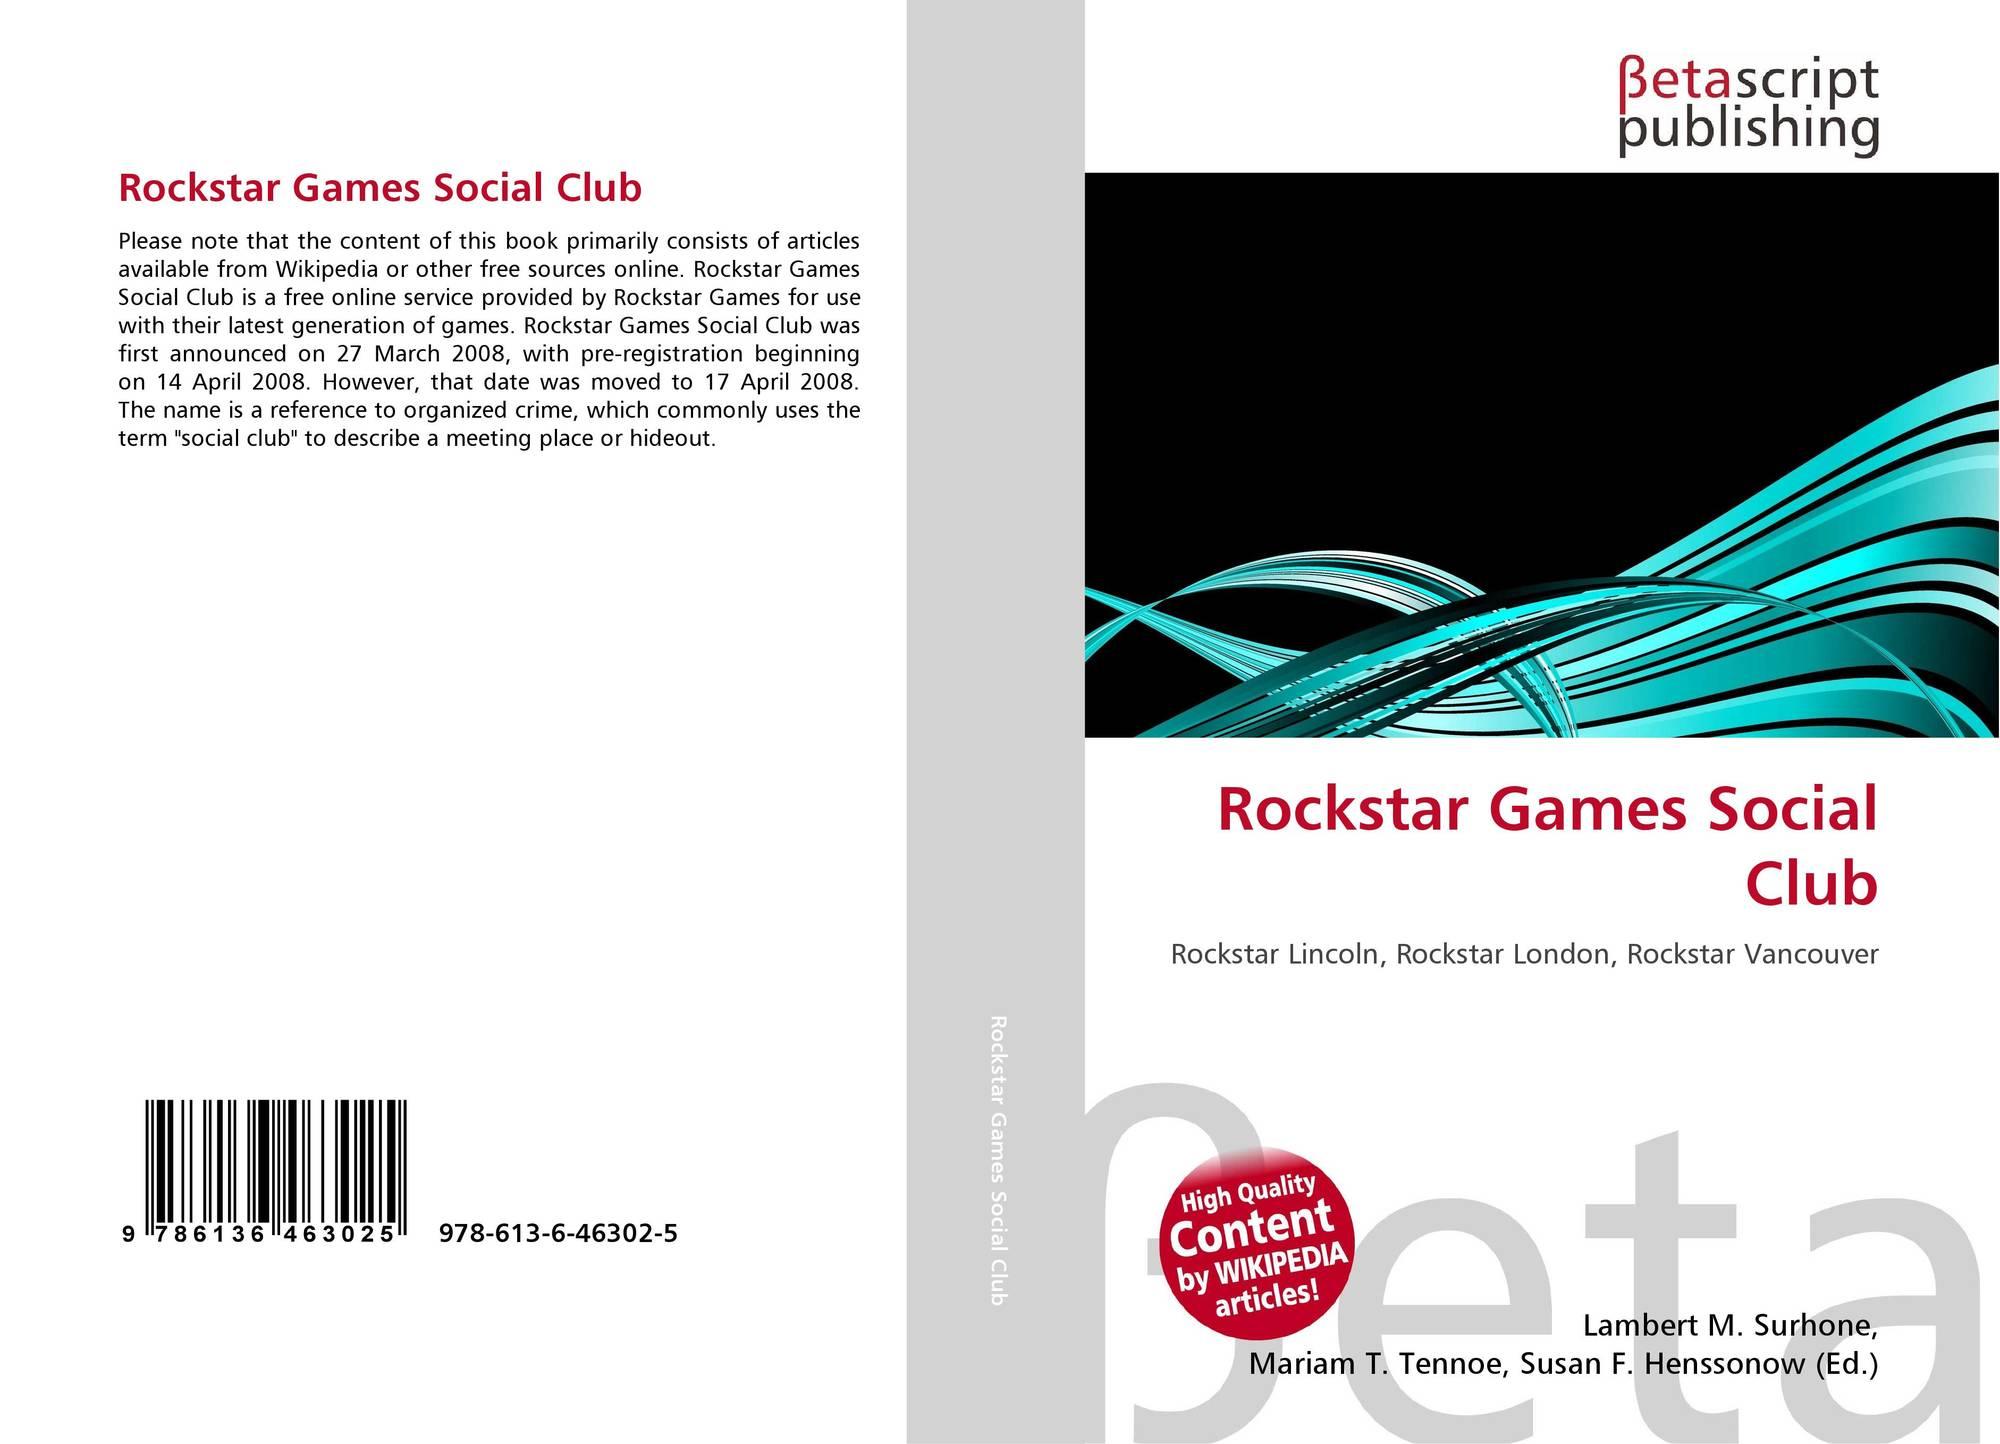 Rockstar Games Social Club, 978-613-6-46302-5, 6136463024